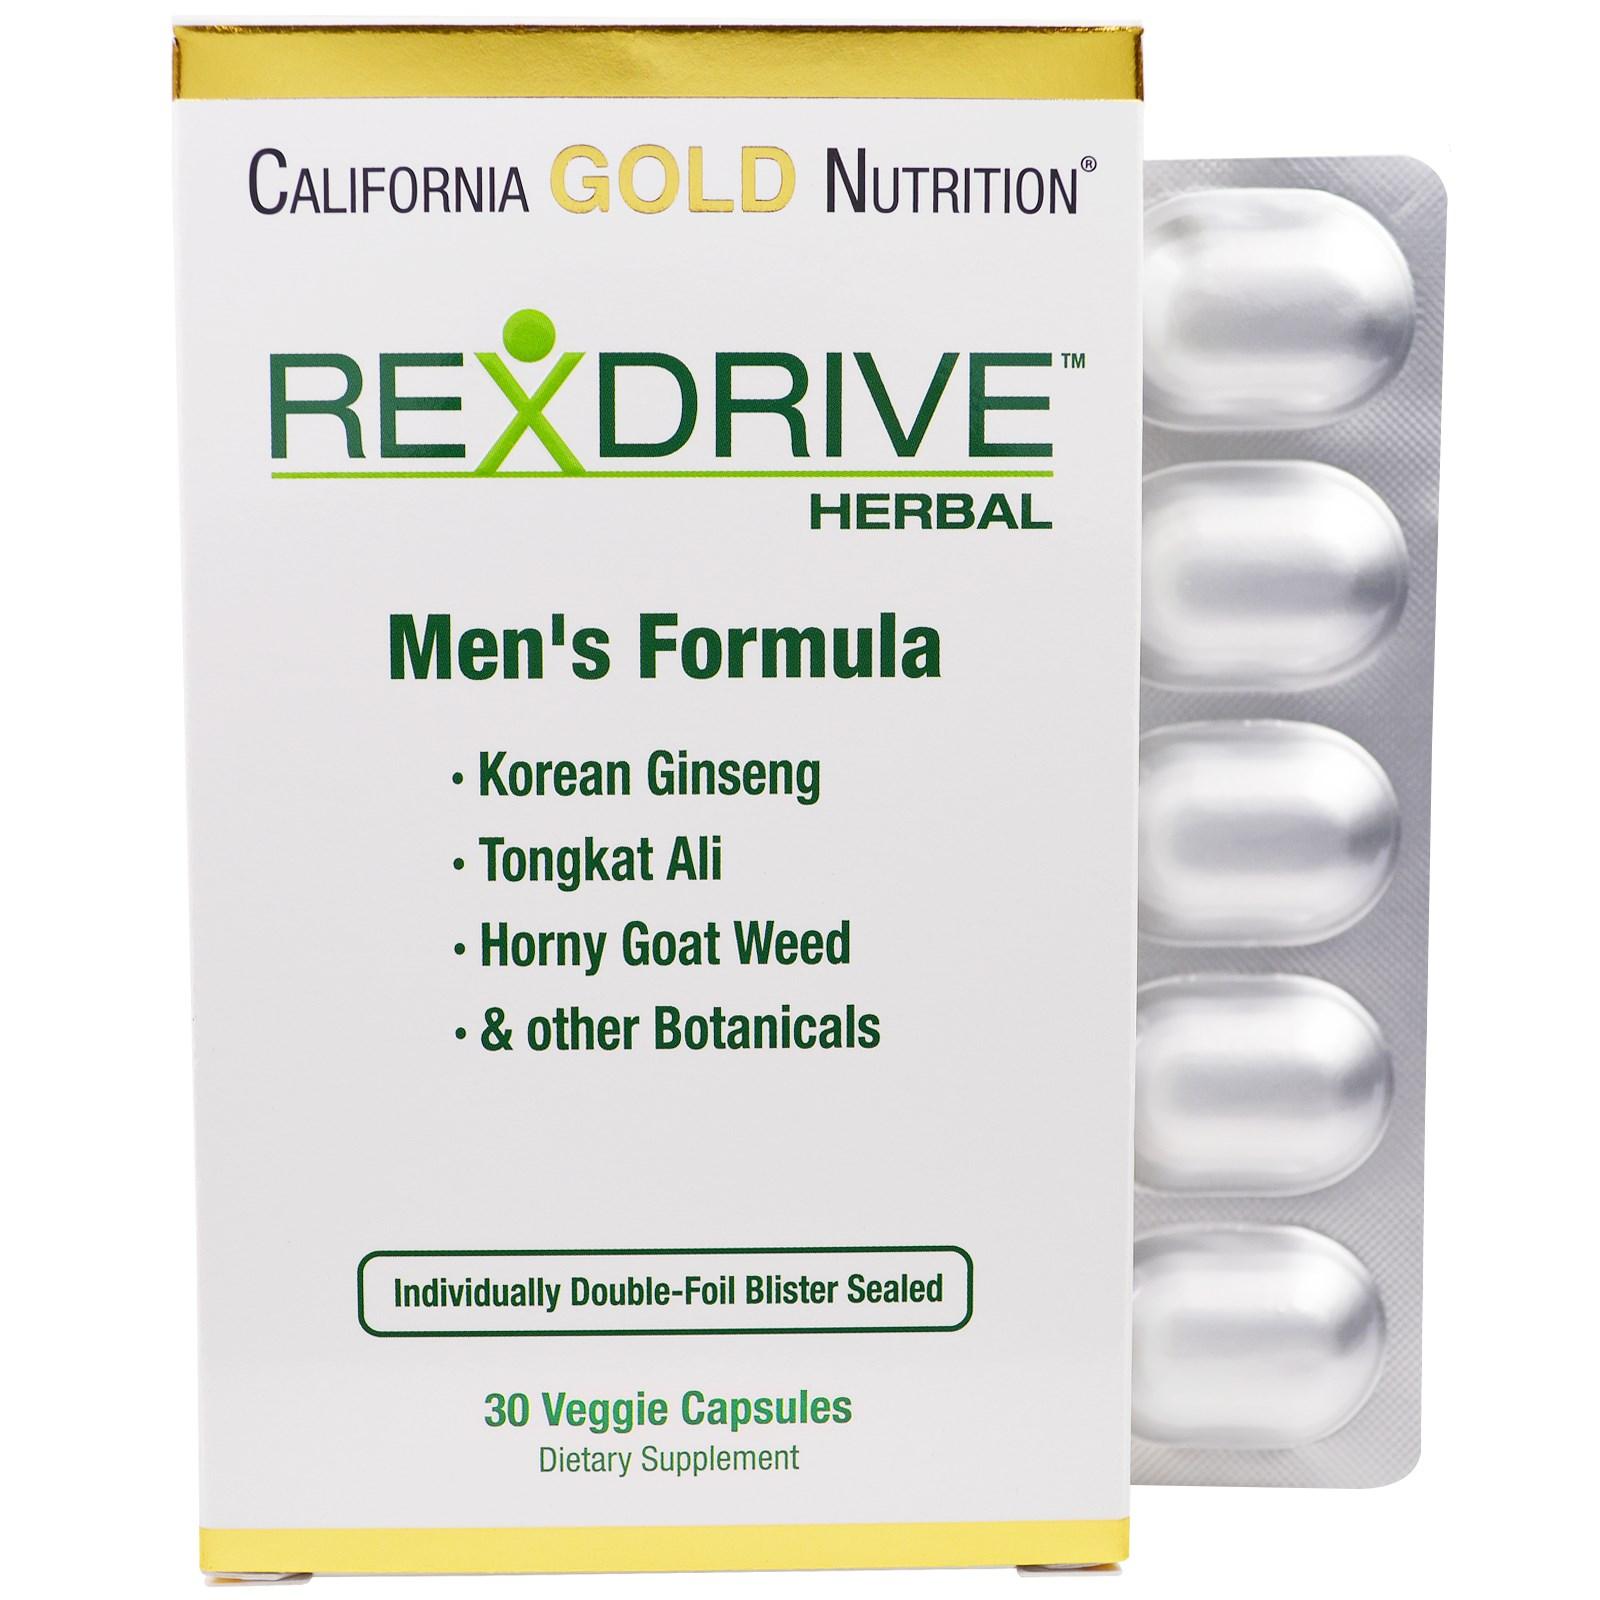 California Gold Nutrition, Rexdrive Herbal, формула для мужчин, 30 растительных капсул